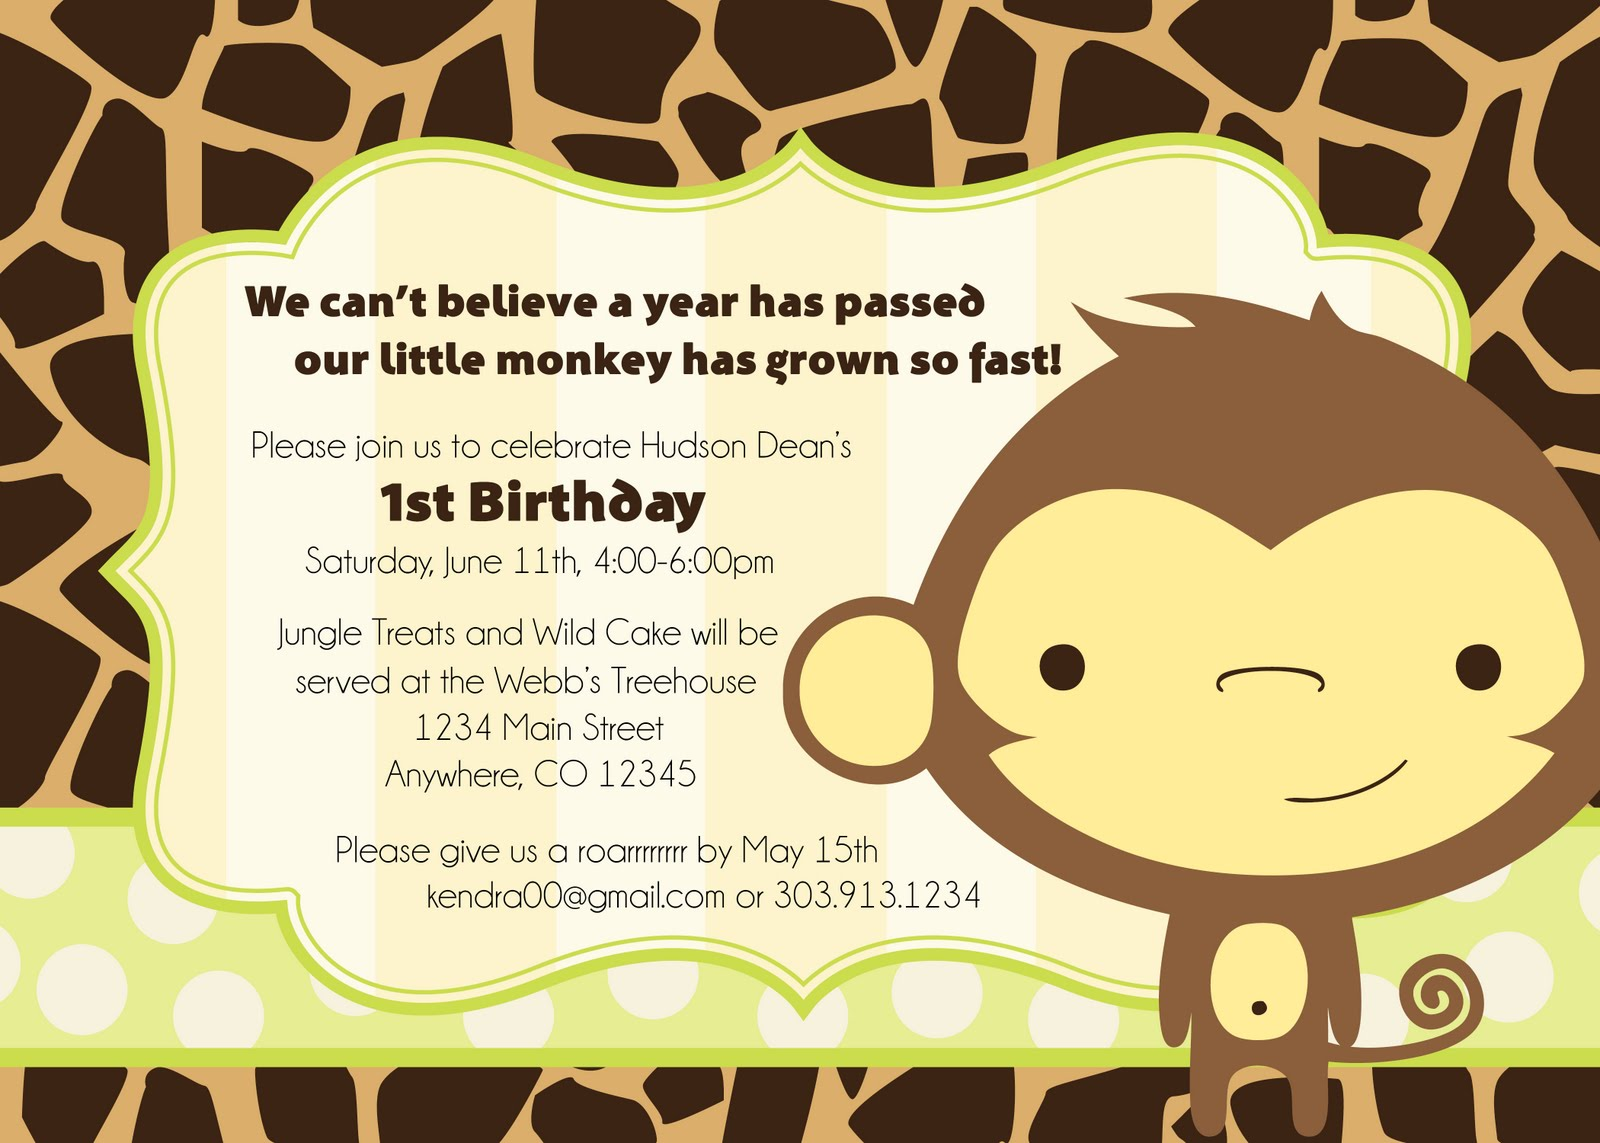 Internet Party Invitations printable birthday cards funny best – Internet Party Invitations